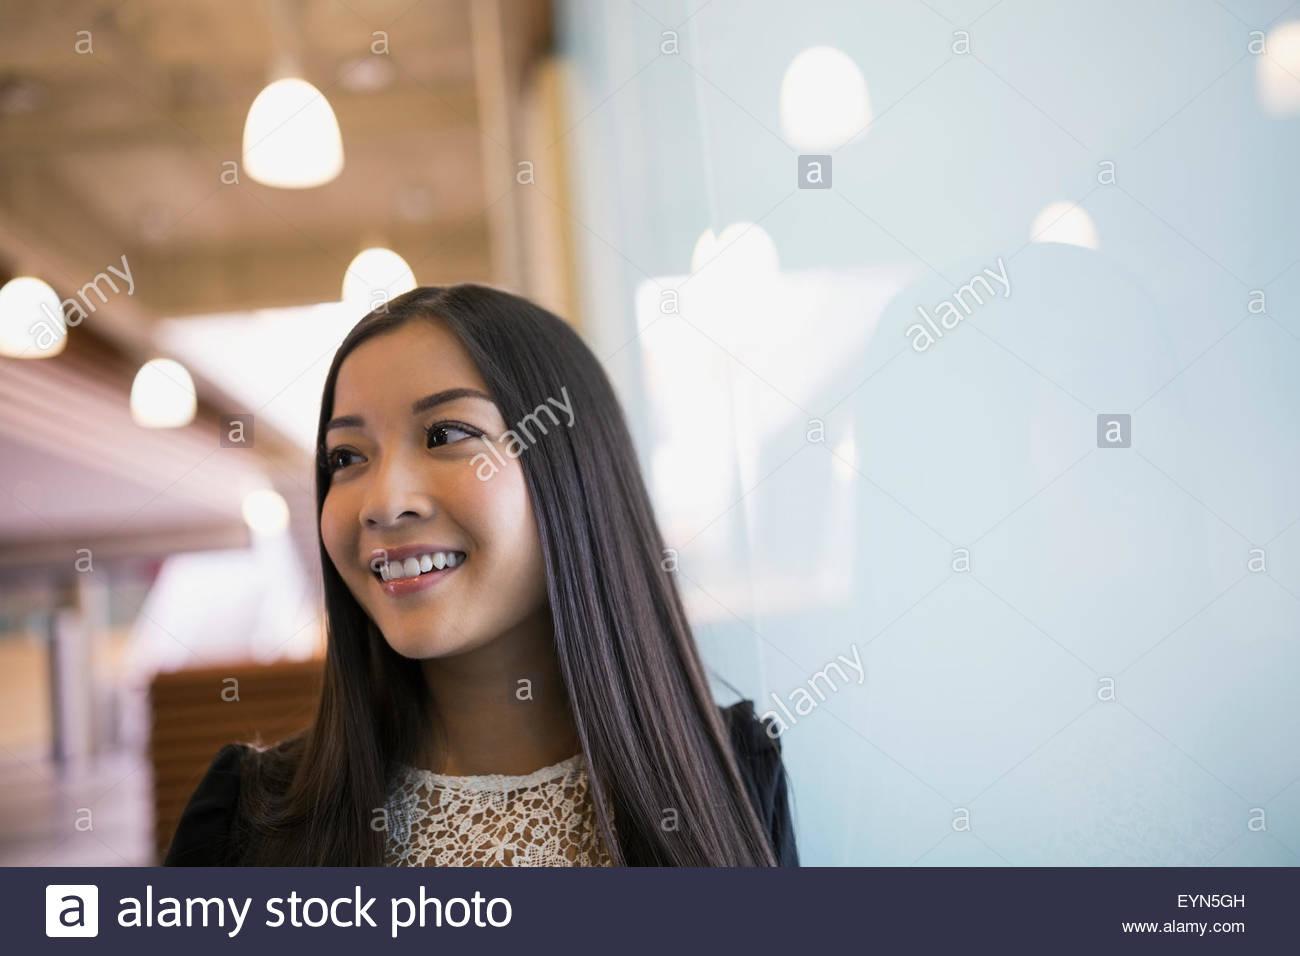 Smiling woman Photo Stock